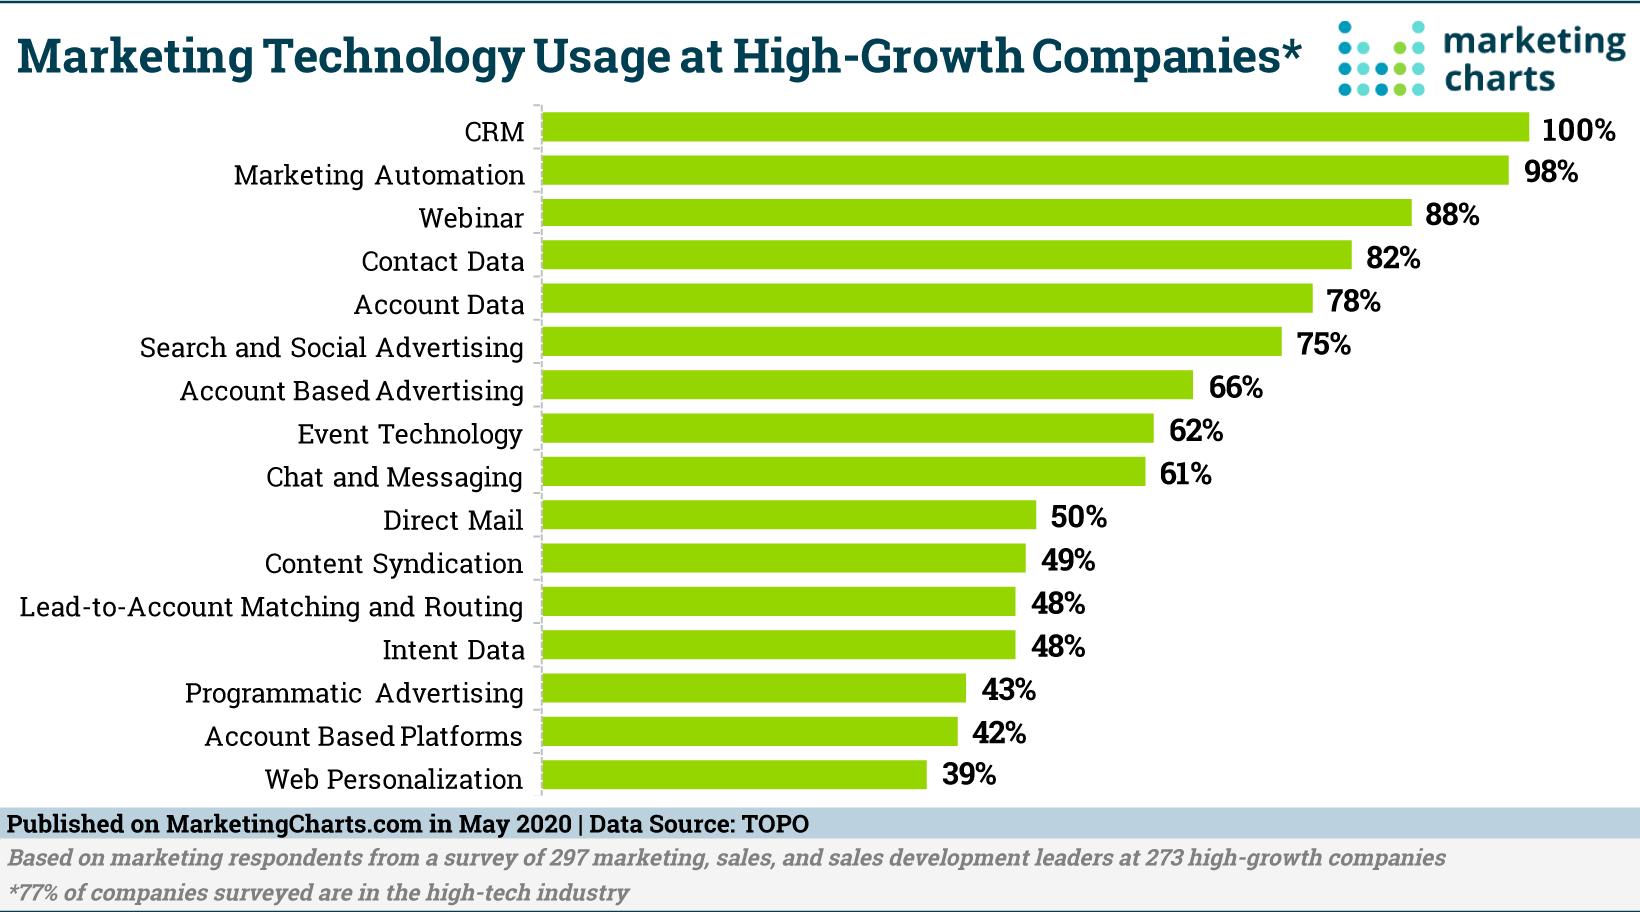 TOPO-MarTech-Usage-High-Growth-Companies-May2020